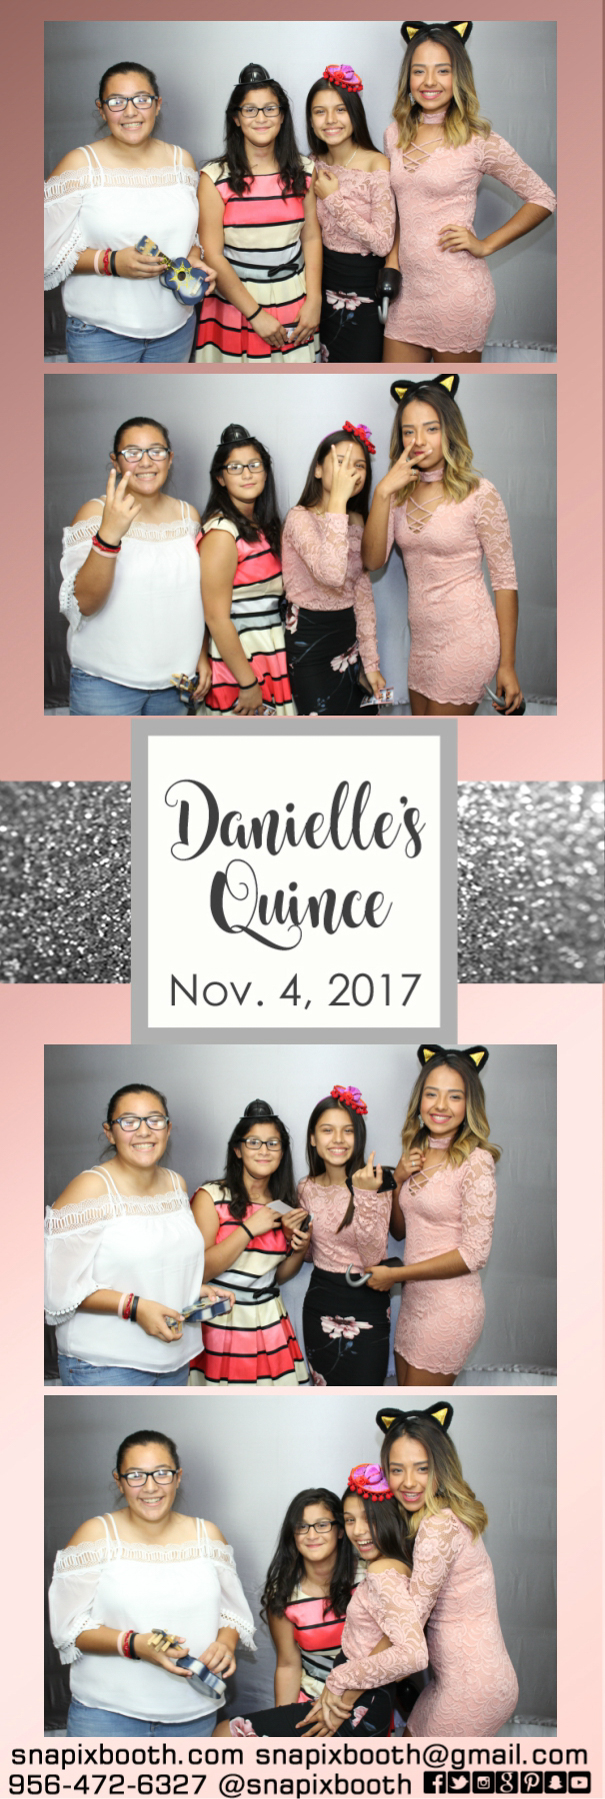 Danielle's Quince